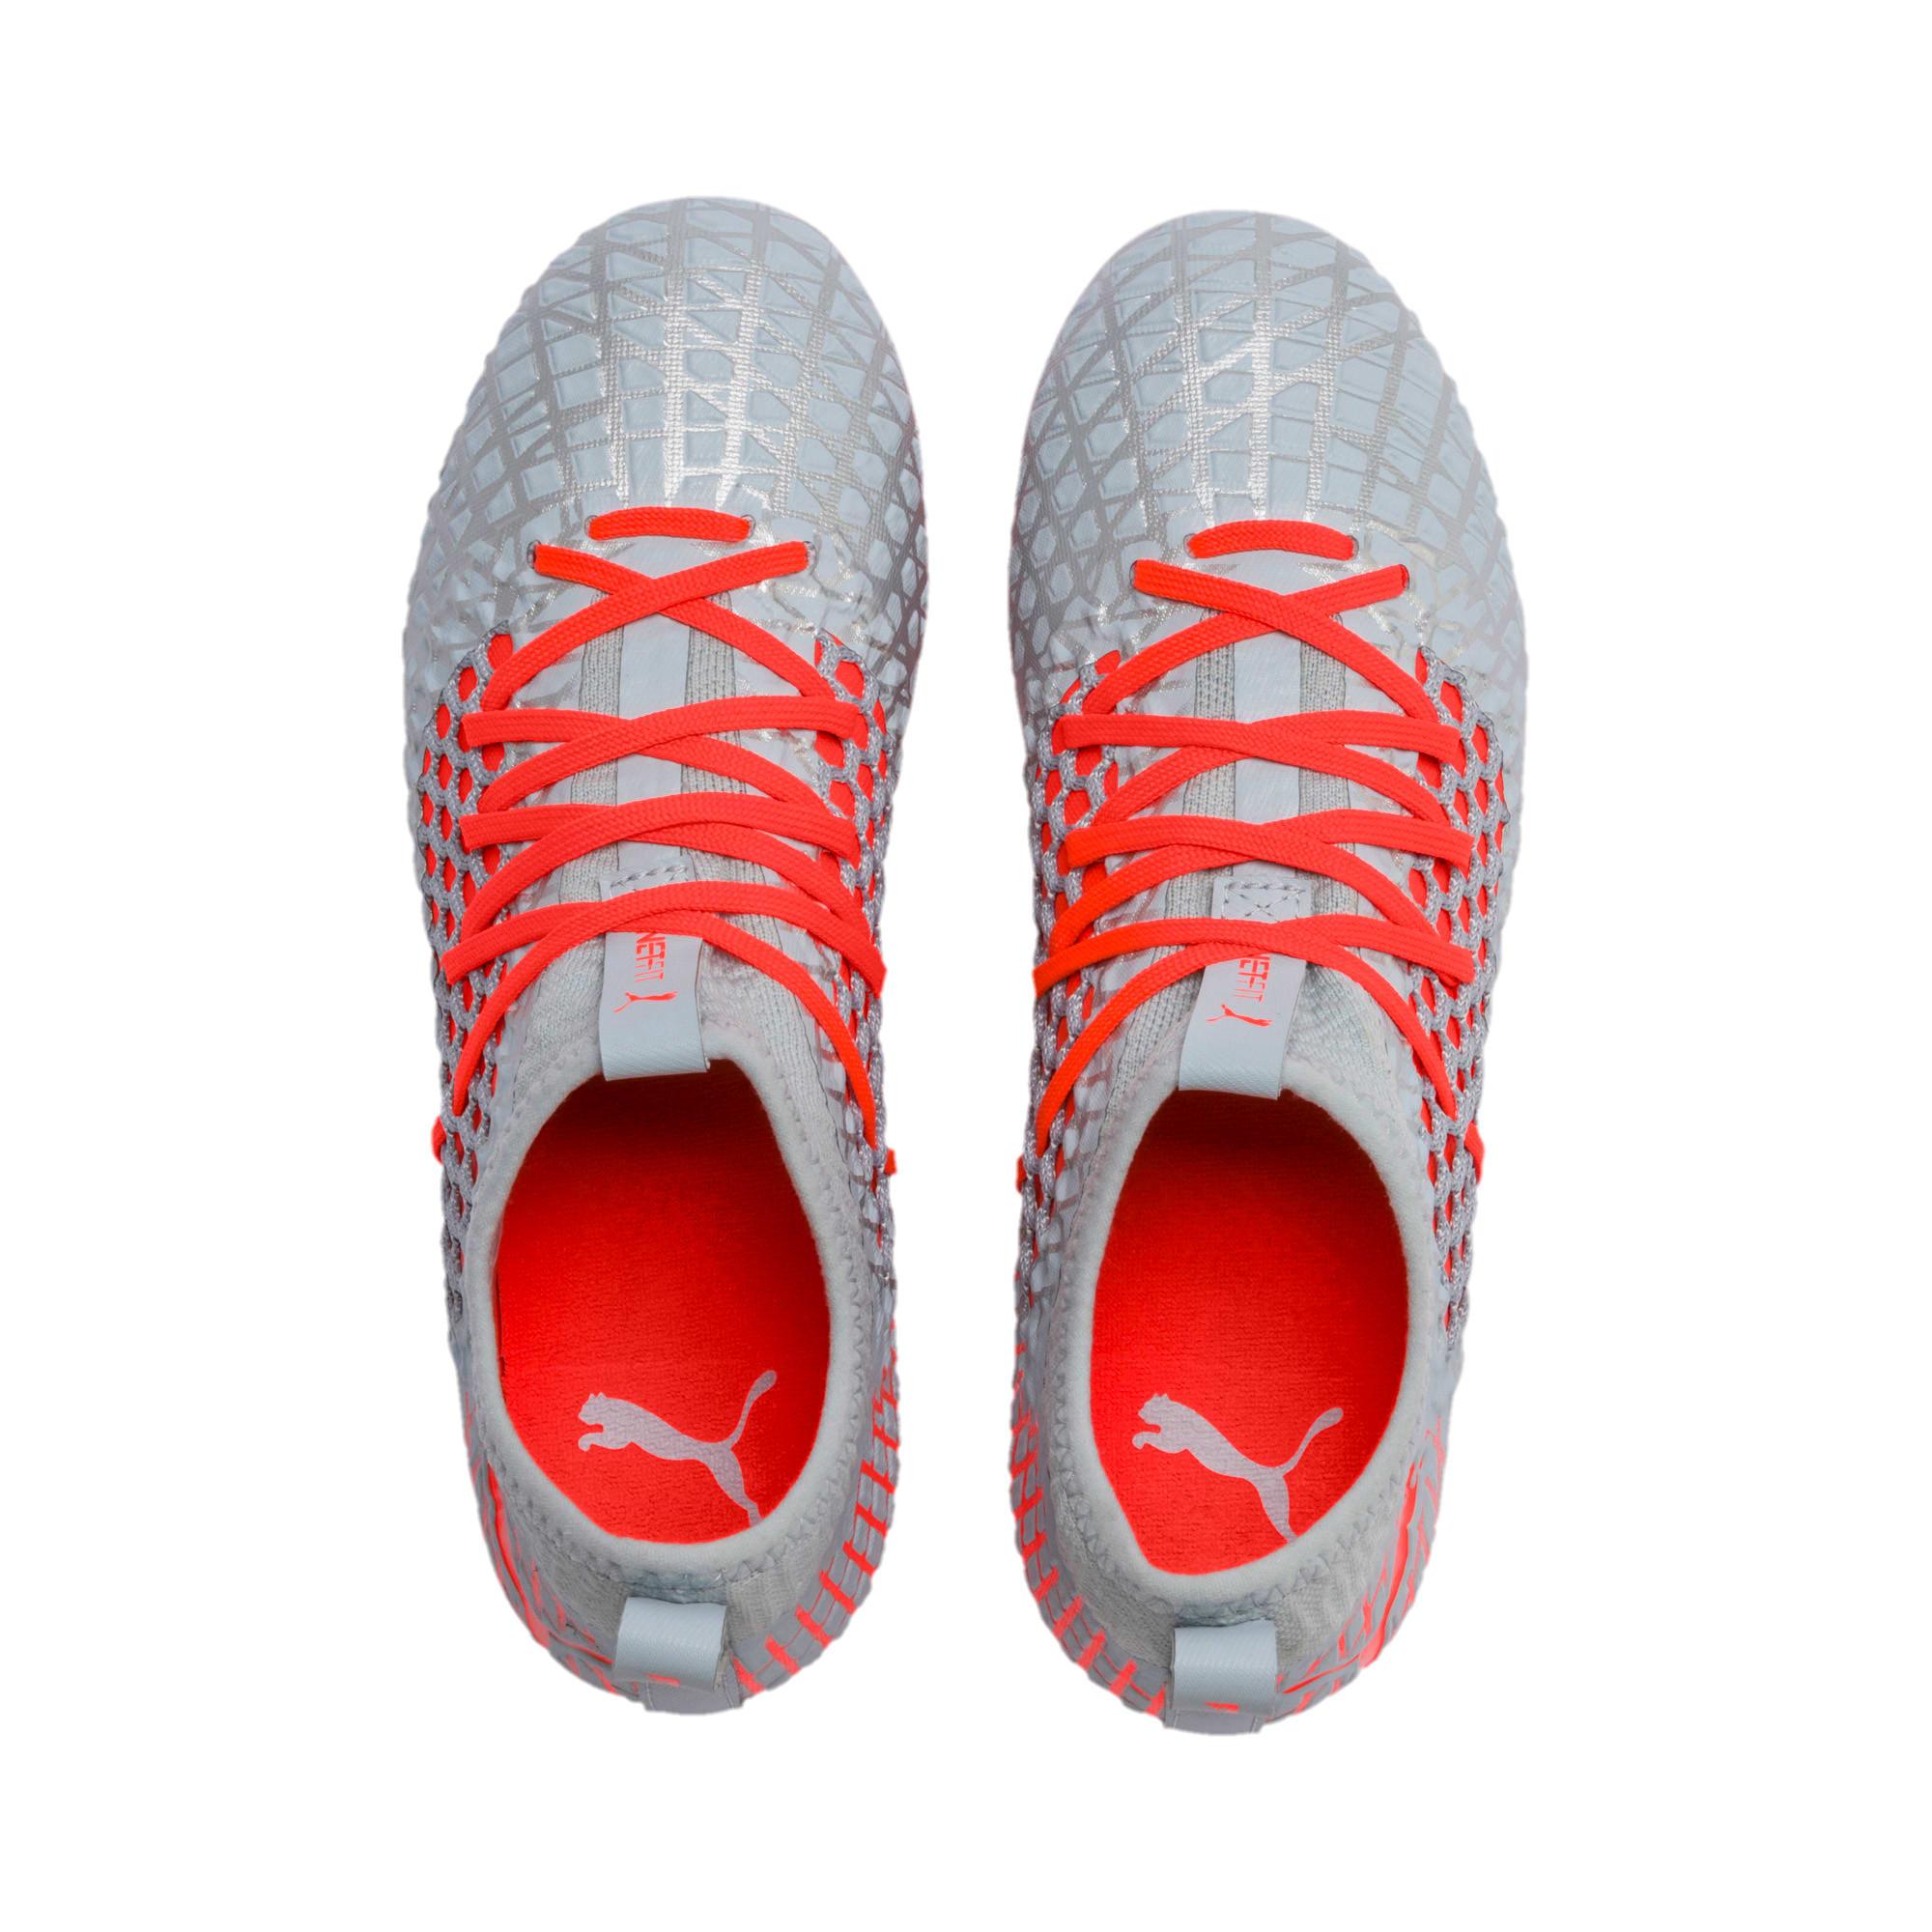 Thumbnail 6 of FUTURE 4.3 NETFIT FG/AG Soccer Cleats JR, Glacial Blue-Nrgy Red, medium